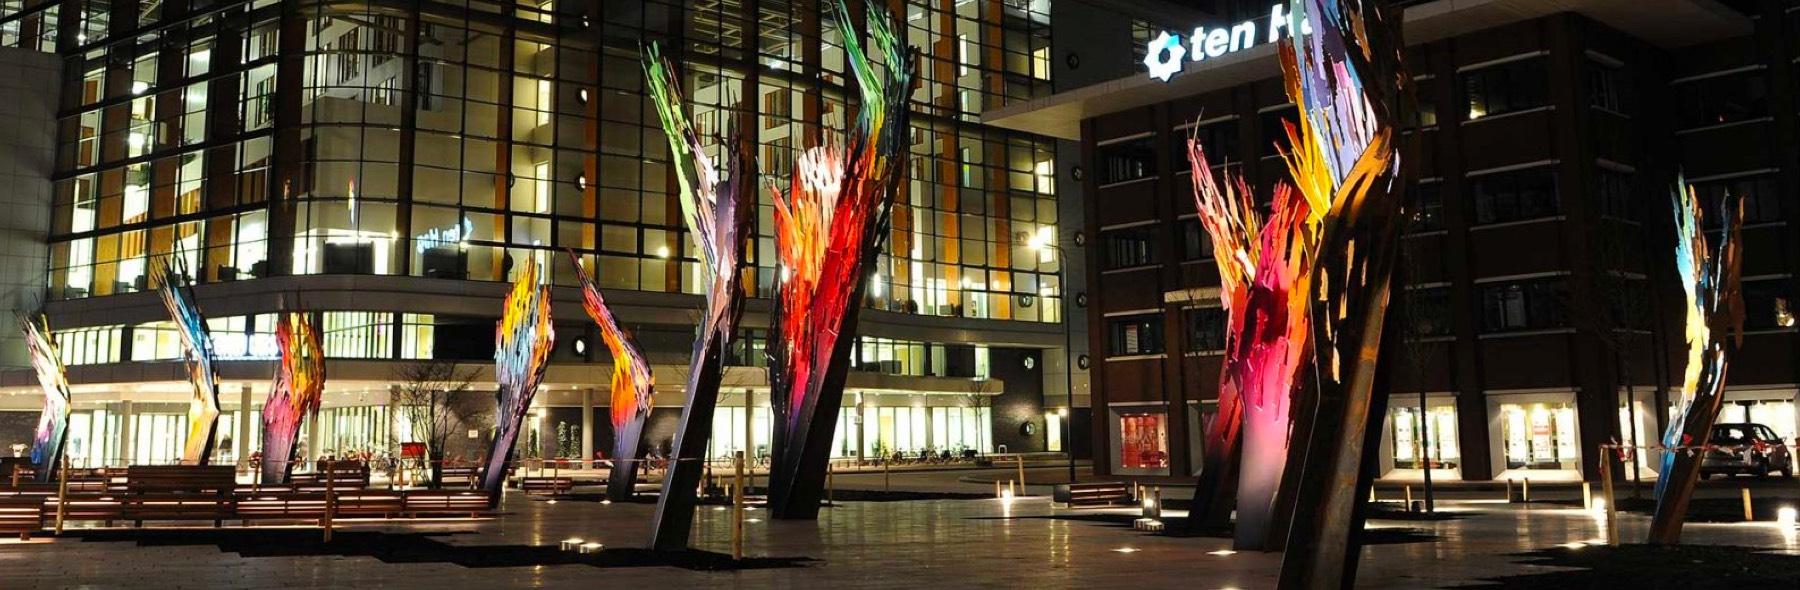 "Conferentie ""Eindhoven Energieneutraal"""